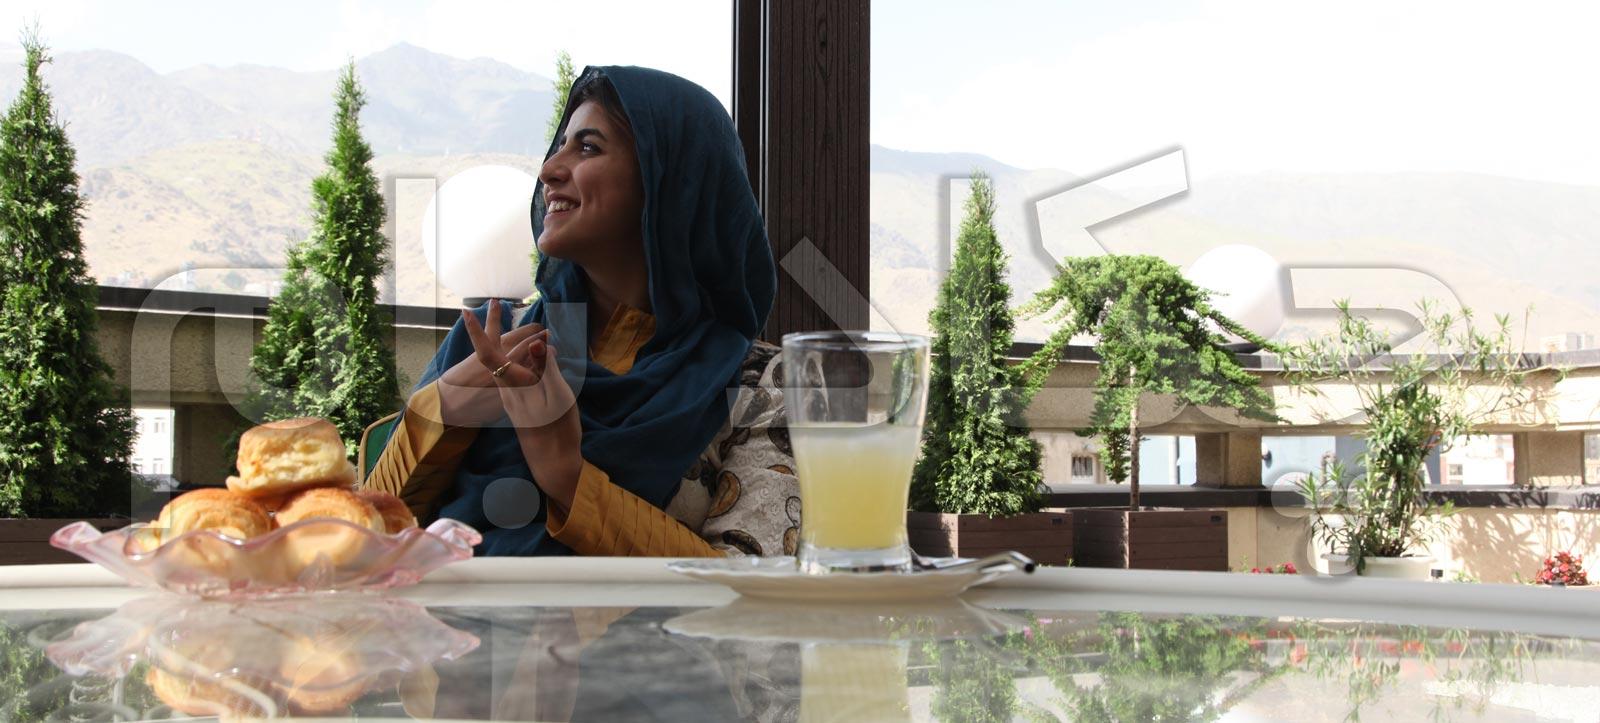 green terrace balcony in tehran iran